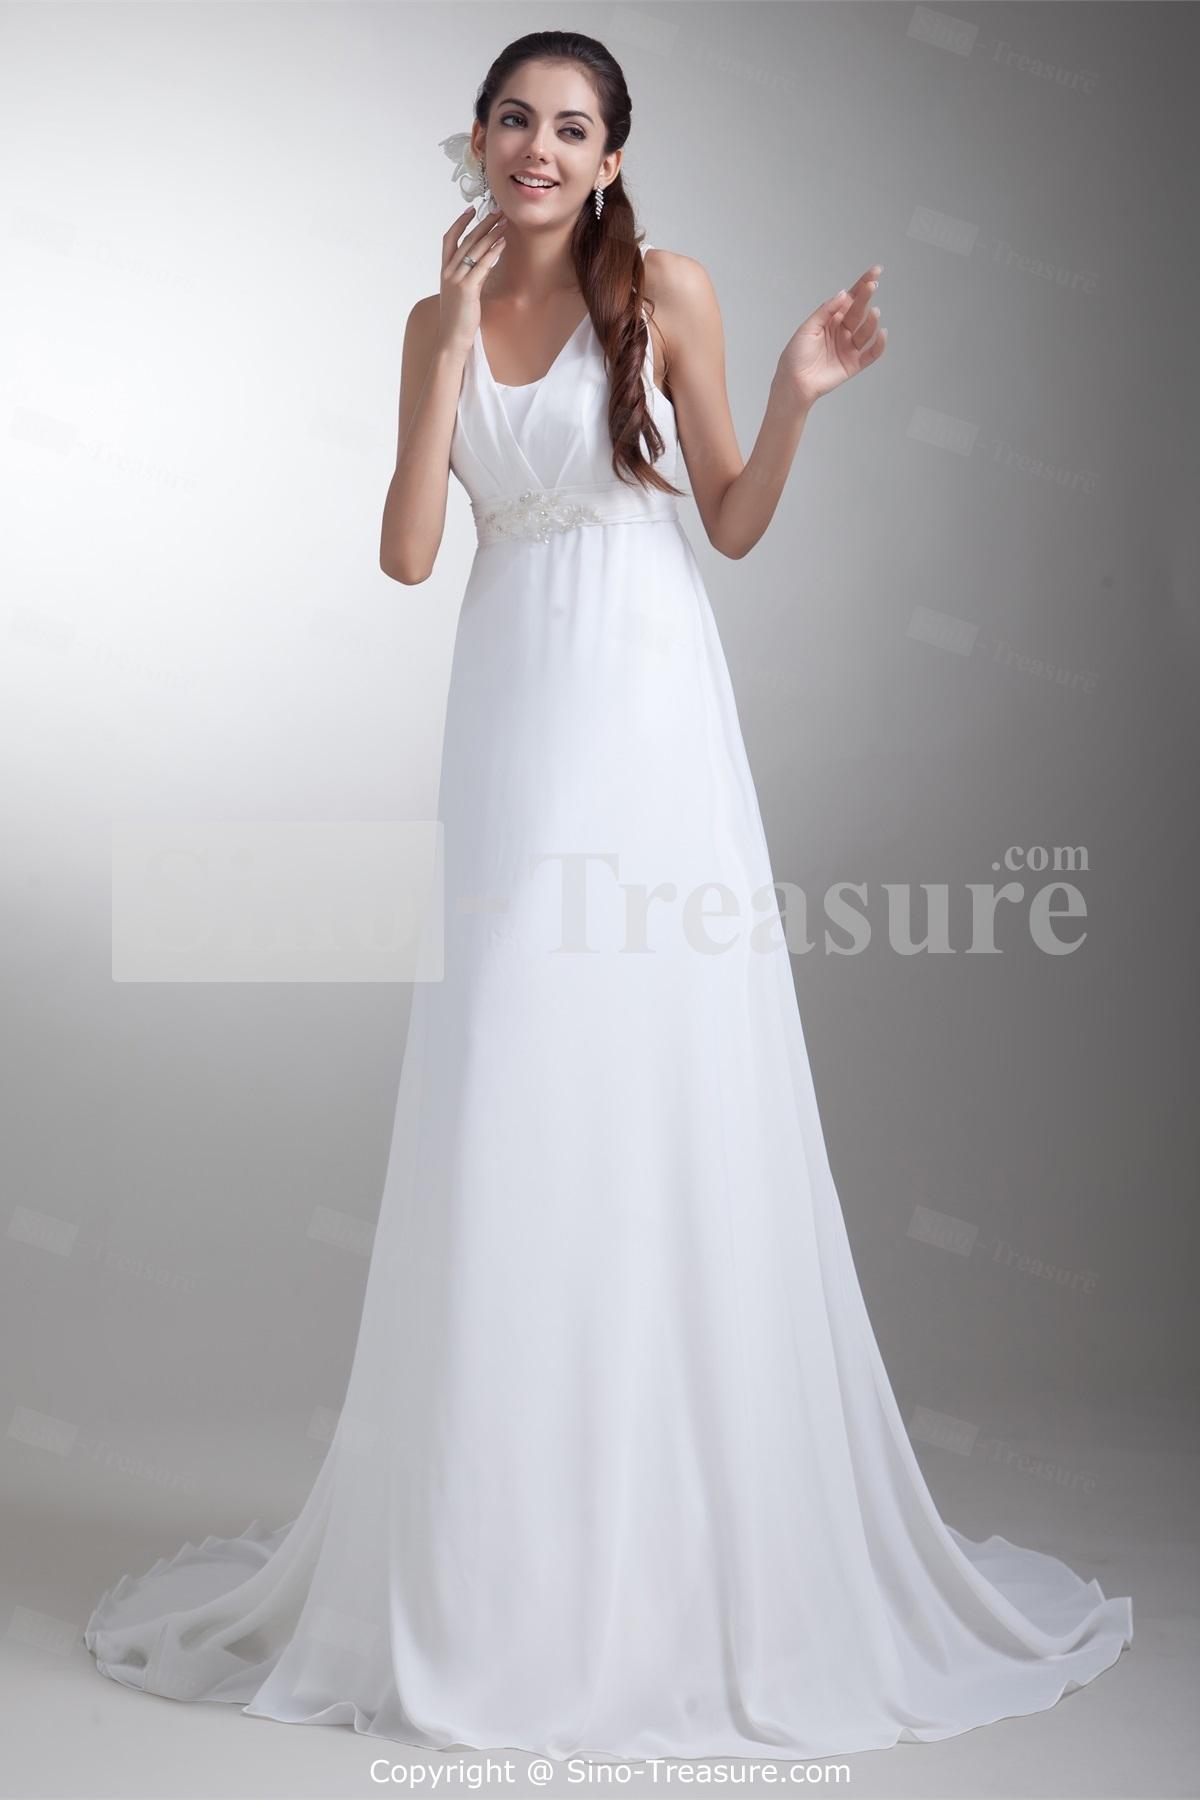 white summer wedding dresses photo - 1